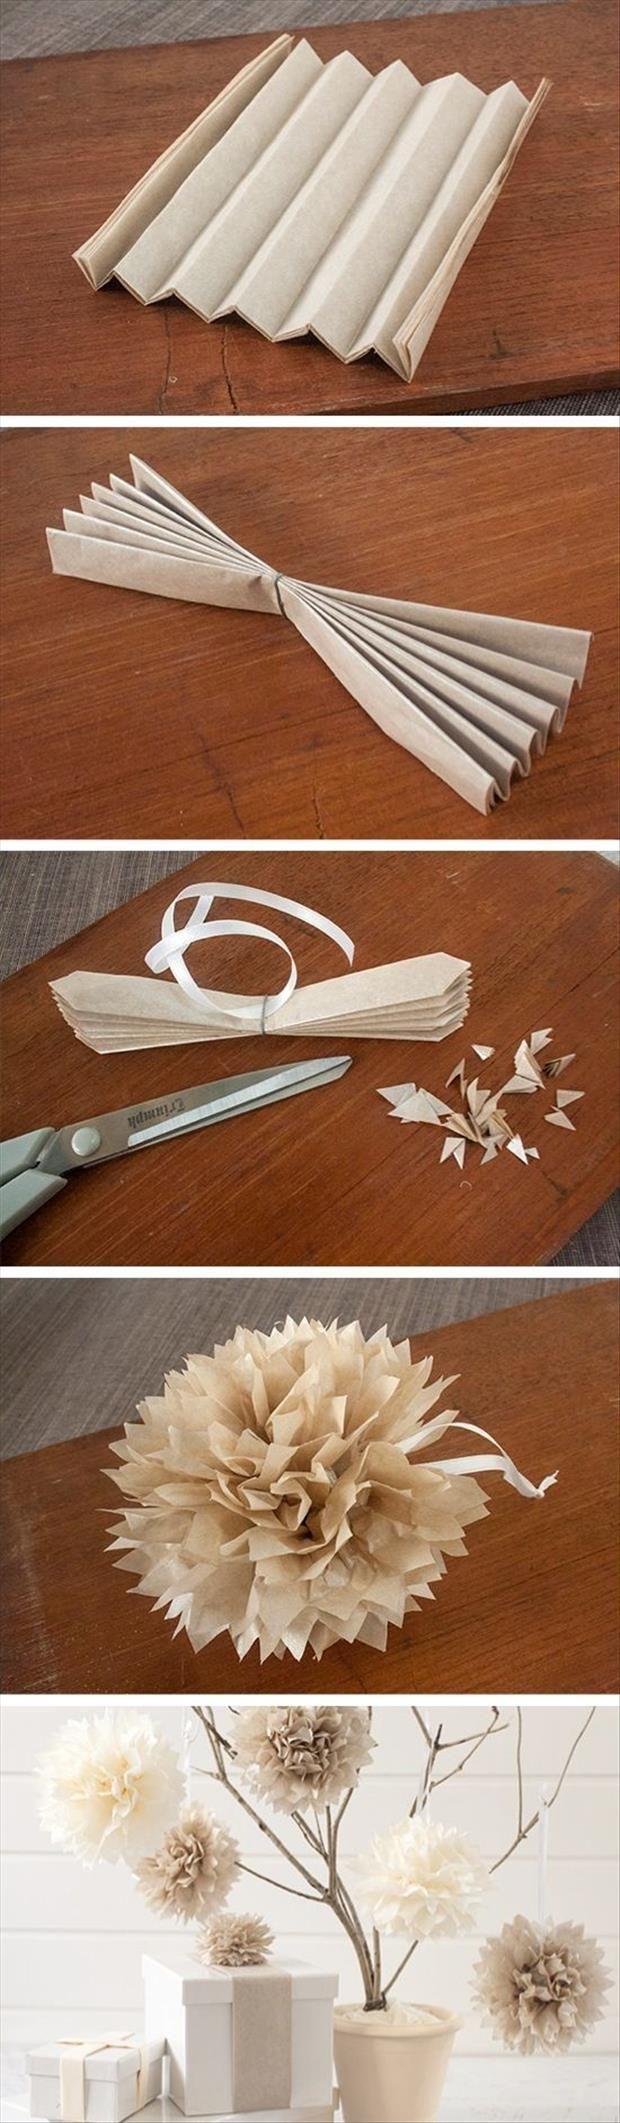 Simple Ideas That Are Borderline Crafty   Pics  Crafty Diy